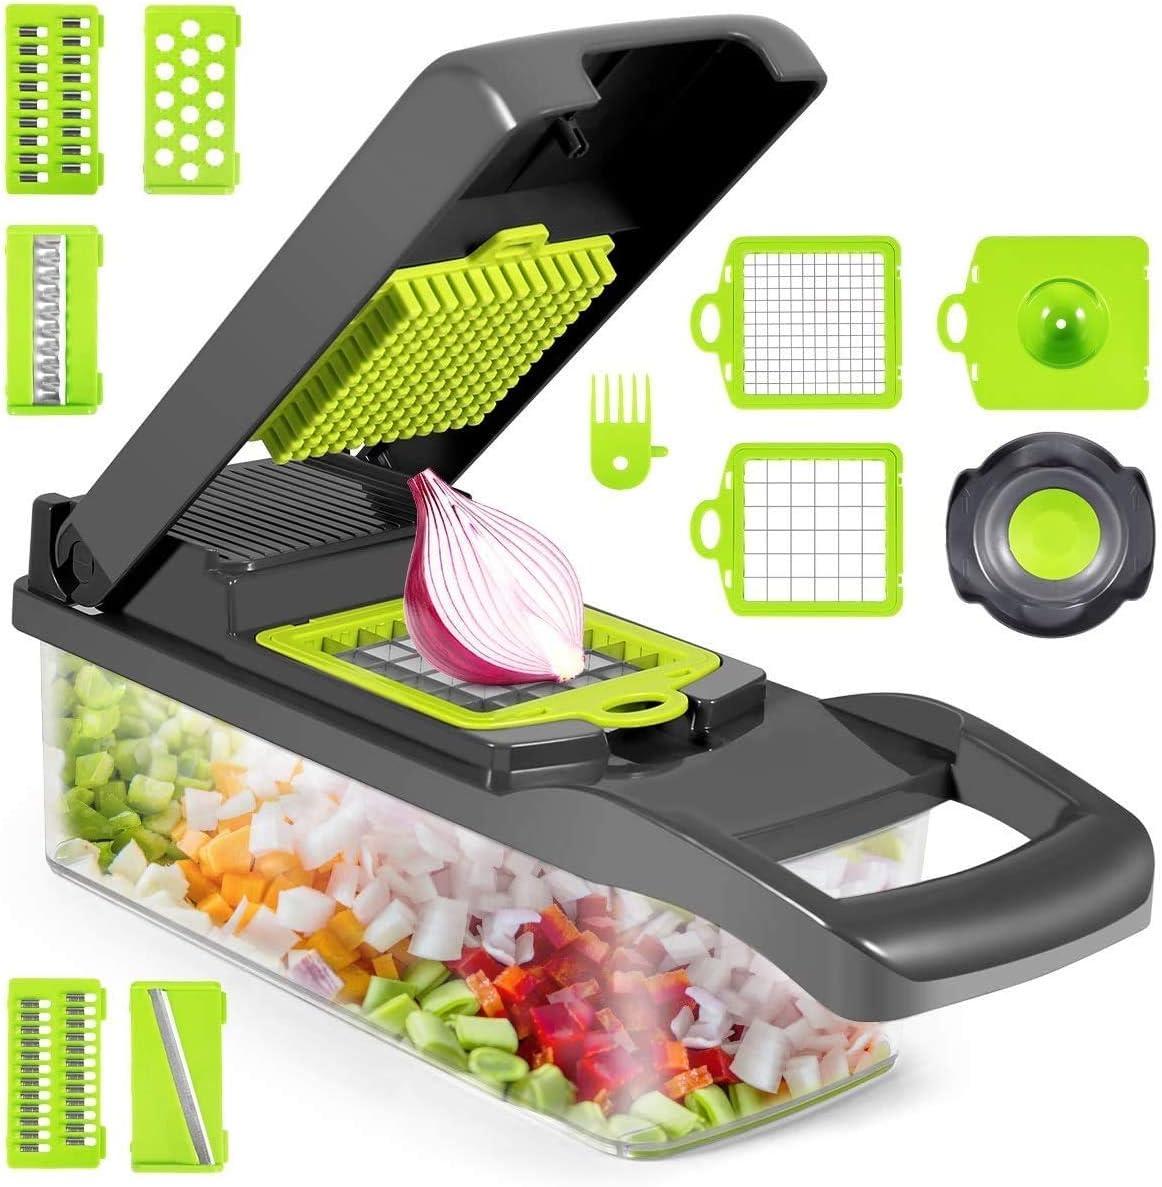 BOXITIZE Multi-function Set of 12 Mandolin Slicer Vegetable Chopper, Fruit Dicer, Egg Slicer, Veggie Cutter, Onion Slicer, Pro Food Chopper